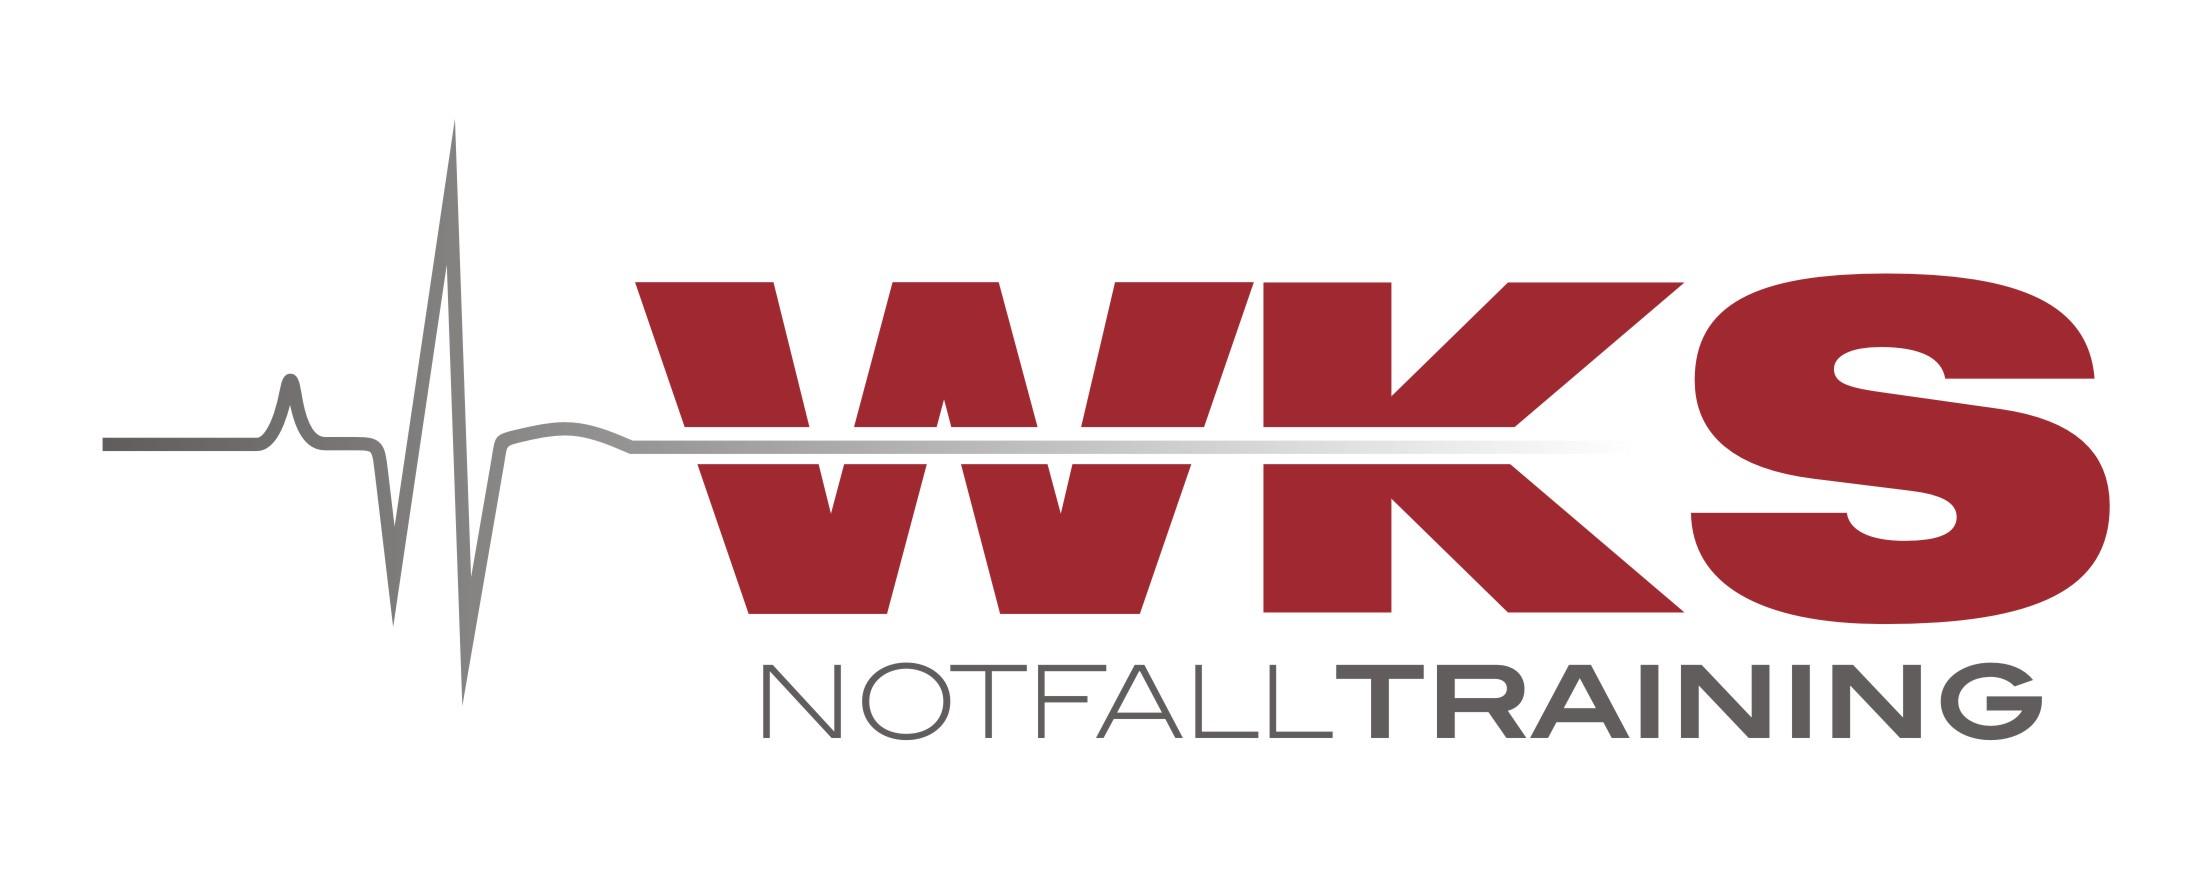 WKS Notfalltraining